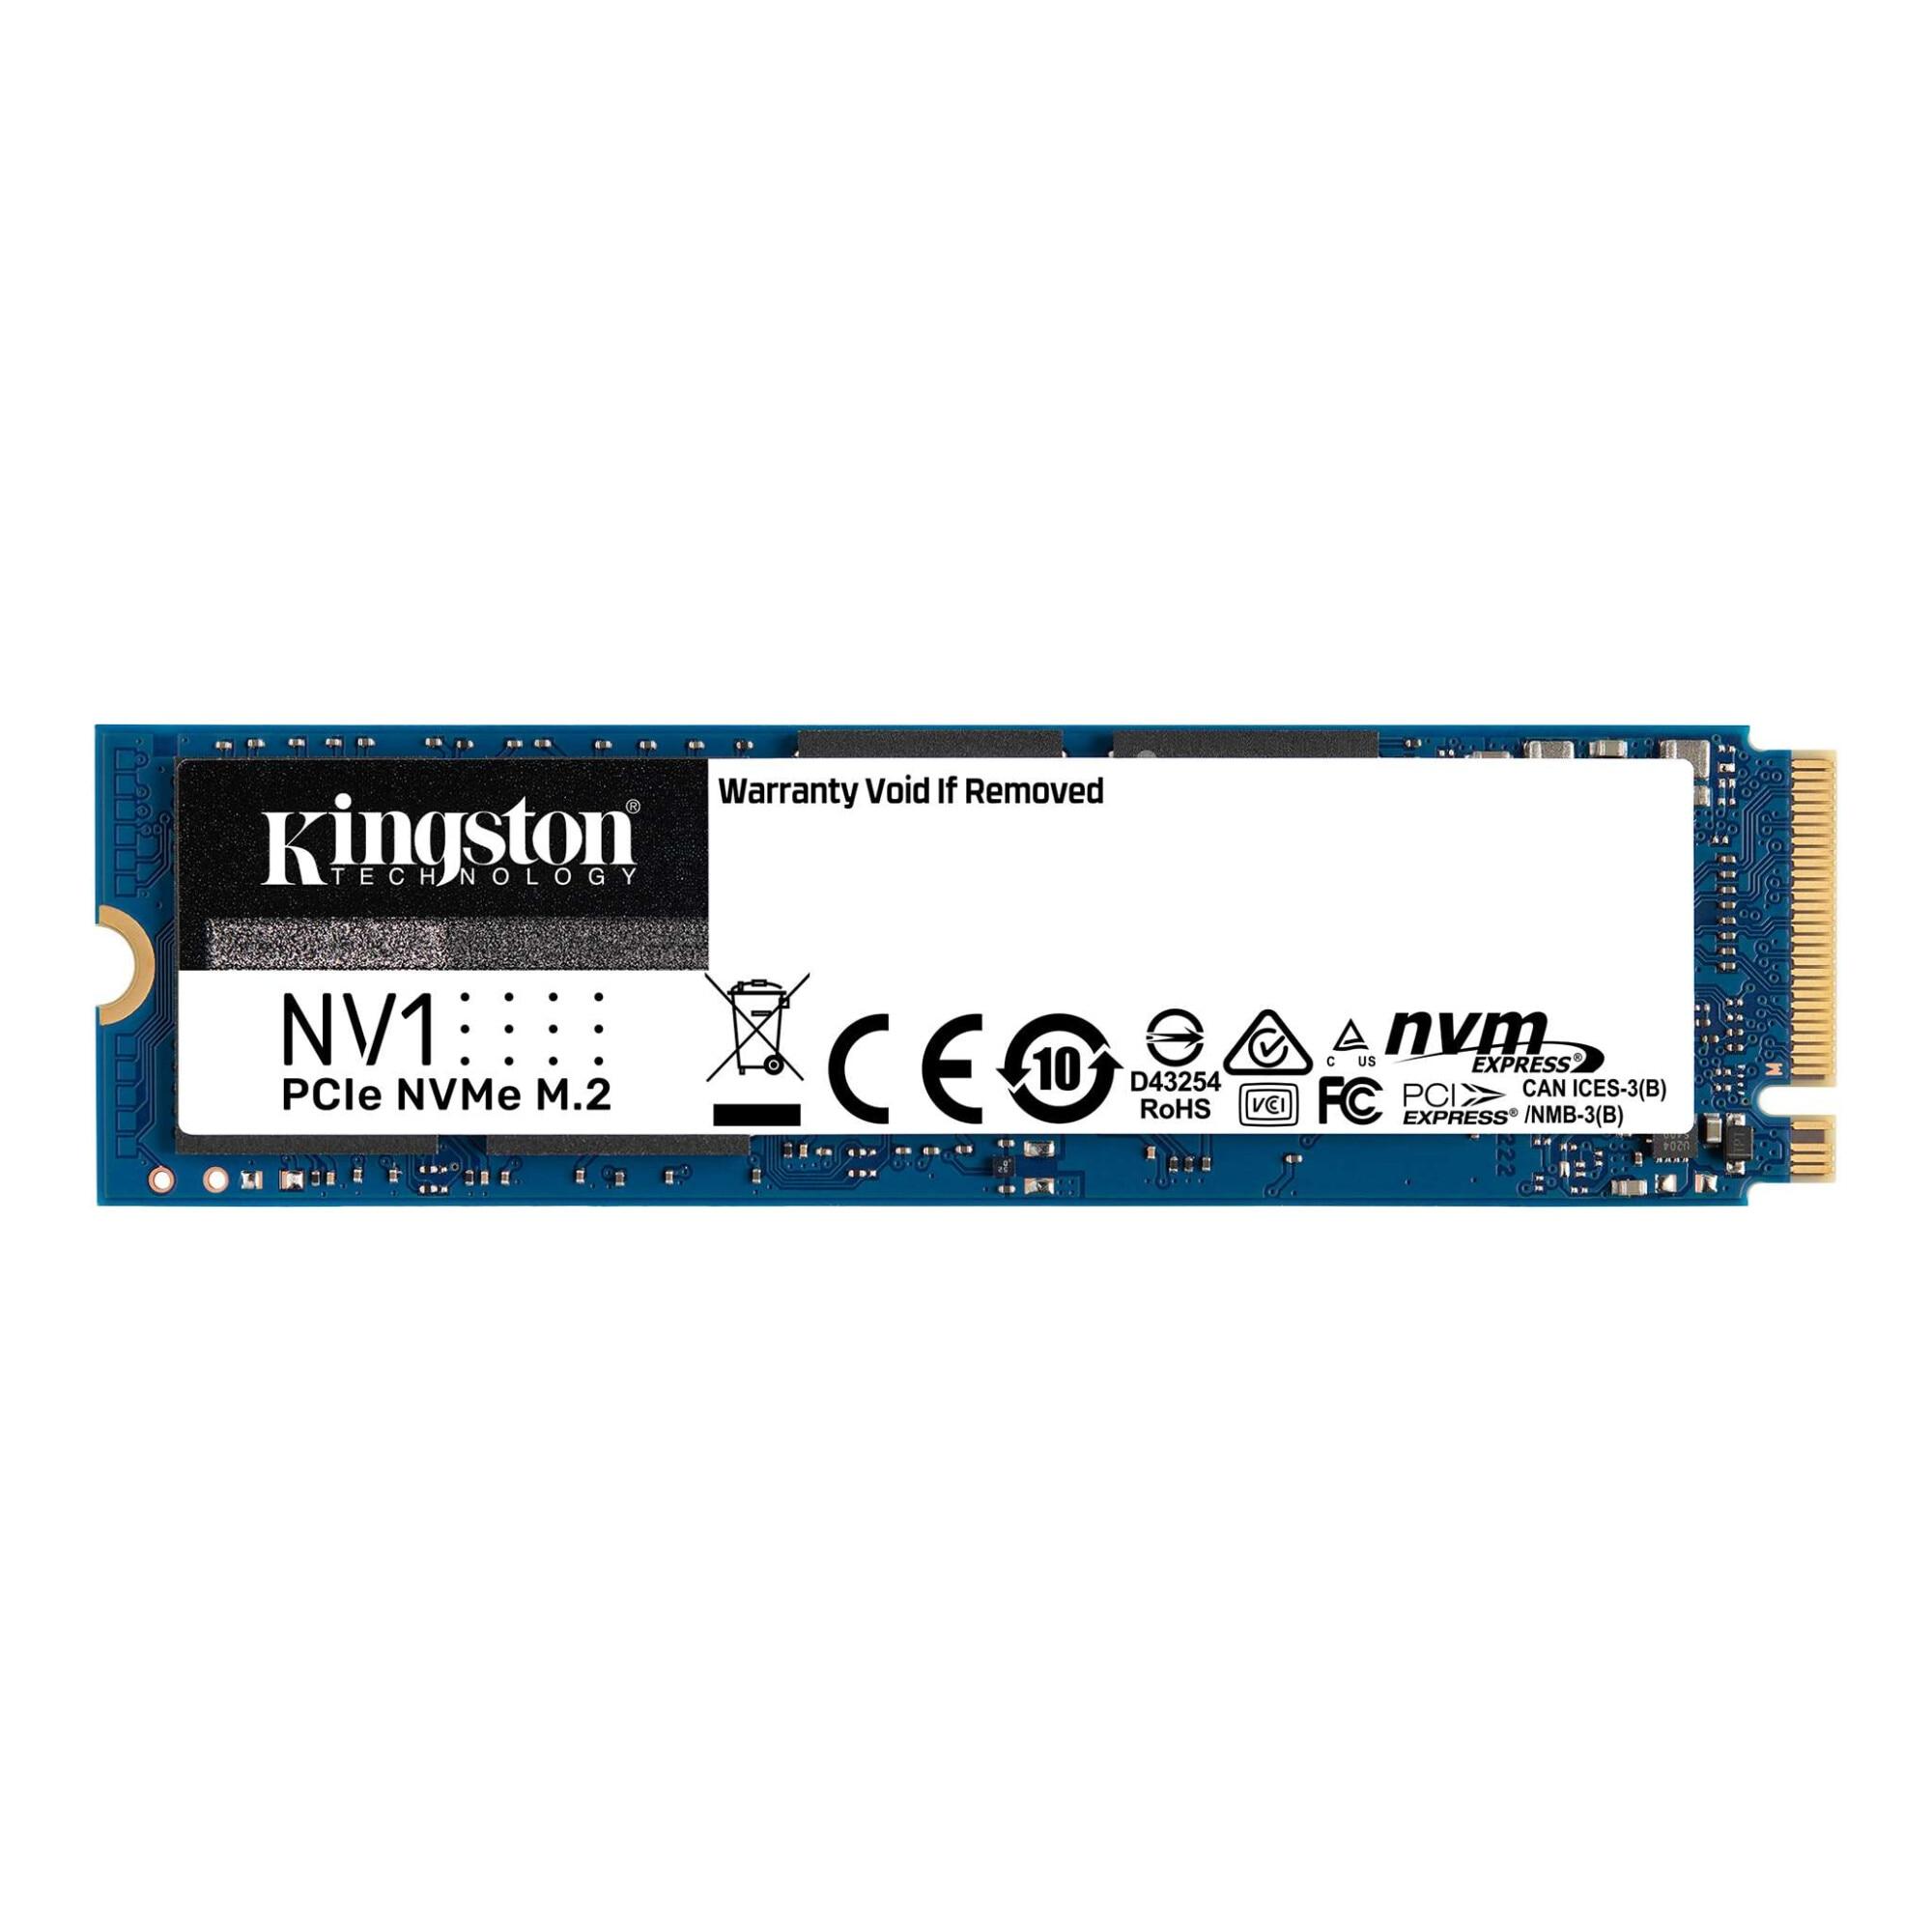 Fotografie Solid State Drive (SSD) Kingston NV1 500GB, NVMe, M.2.